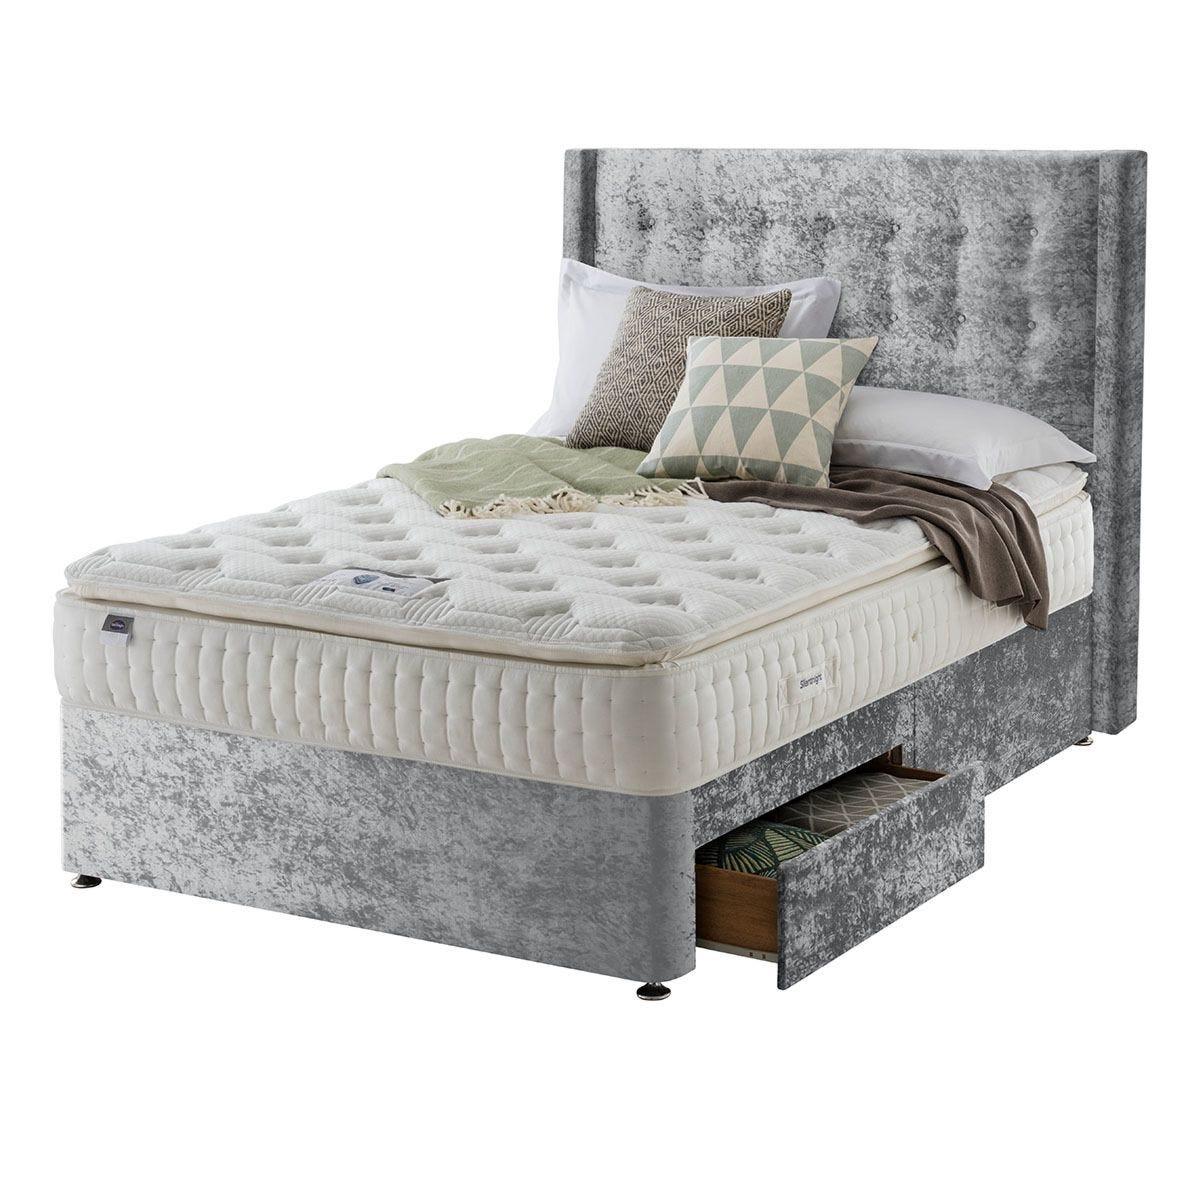 Silentnight Mirapocket Latex 1000 2-Drawer Divan Bed - Crushed Velvet Light Grey Super King